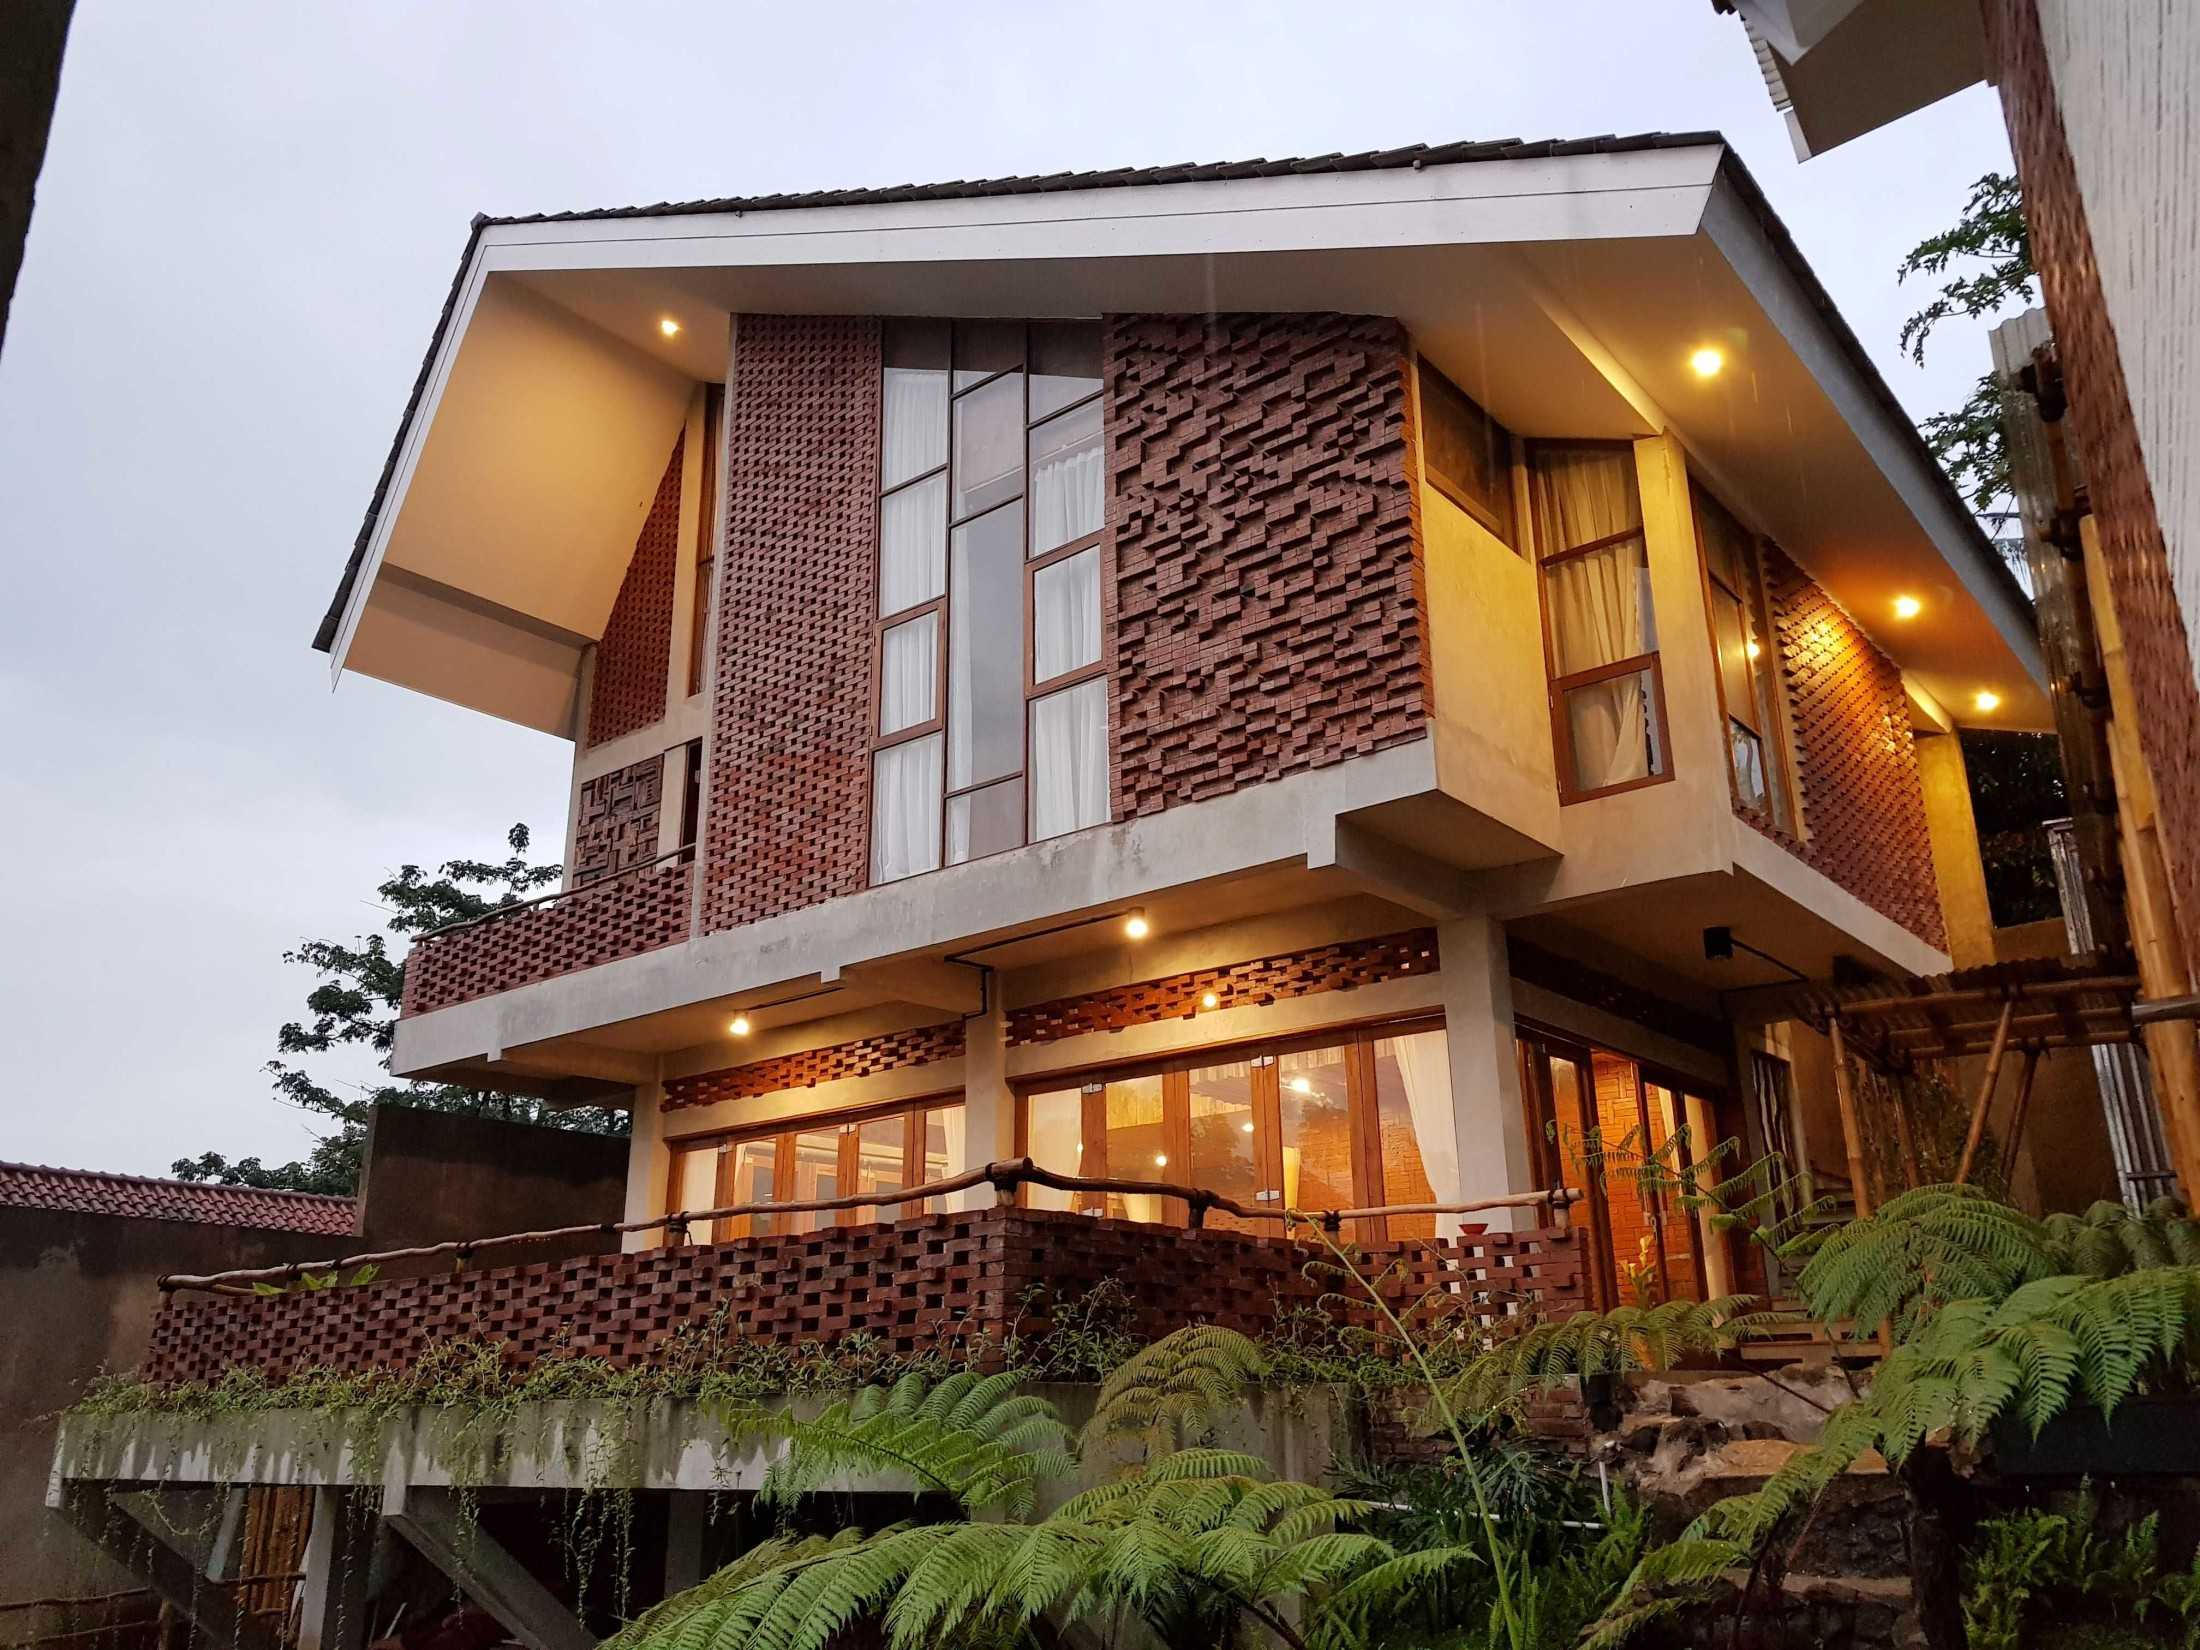 Junge Architekt Studio Imah Bata Villa, Bandung Indonesia Sindanglaya, Cimenyan, Bandung, Jawa Barat, Indonesia Sindanglaya, Cimenyan, Bandung, Jawa Barat, Indonesia Junge-Architekt-Studio-Imah-Bata-Villa-Bandung-Indonesia  67744